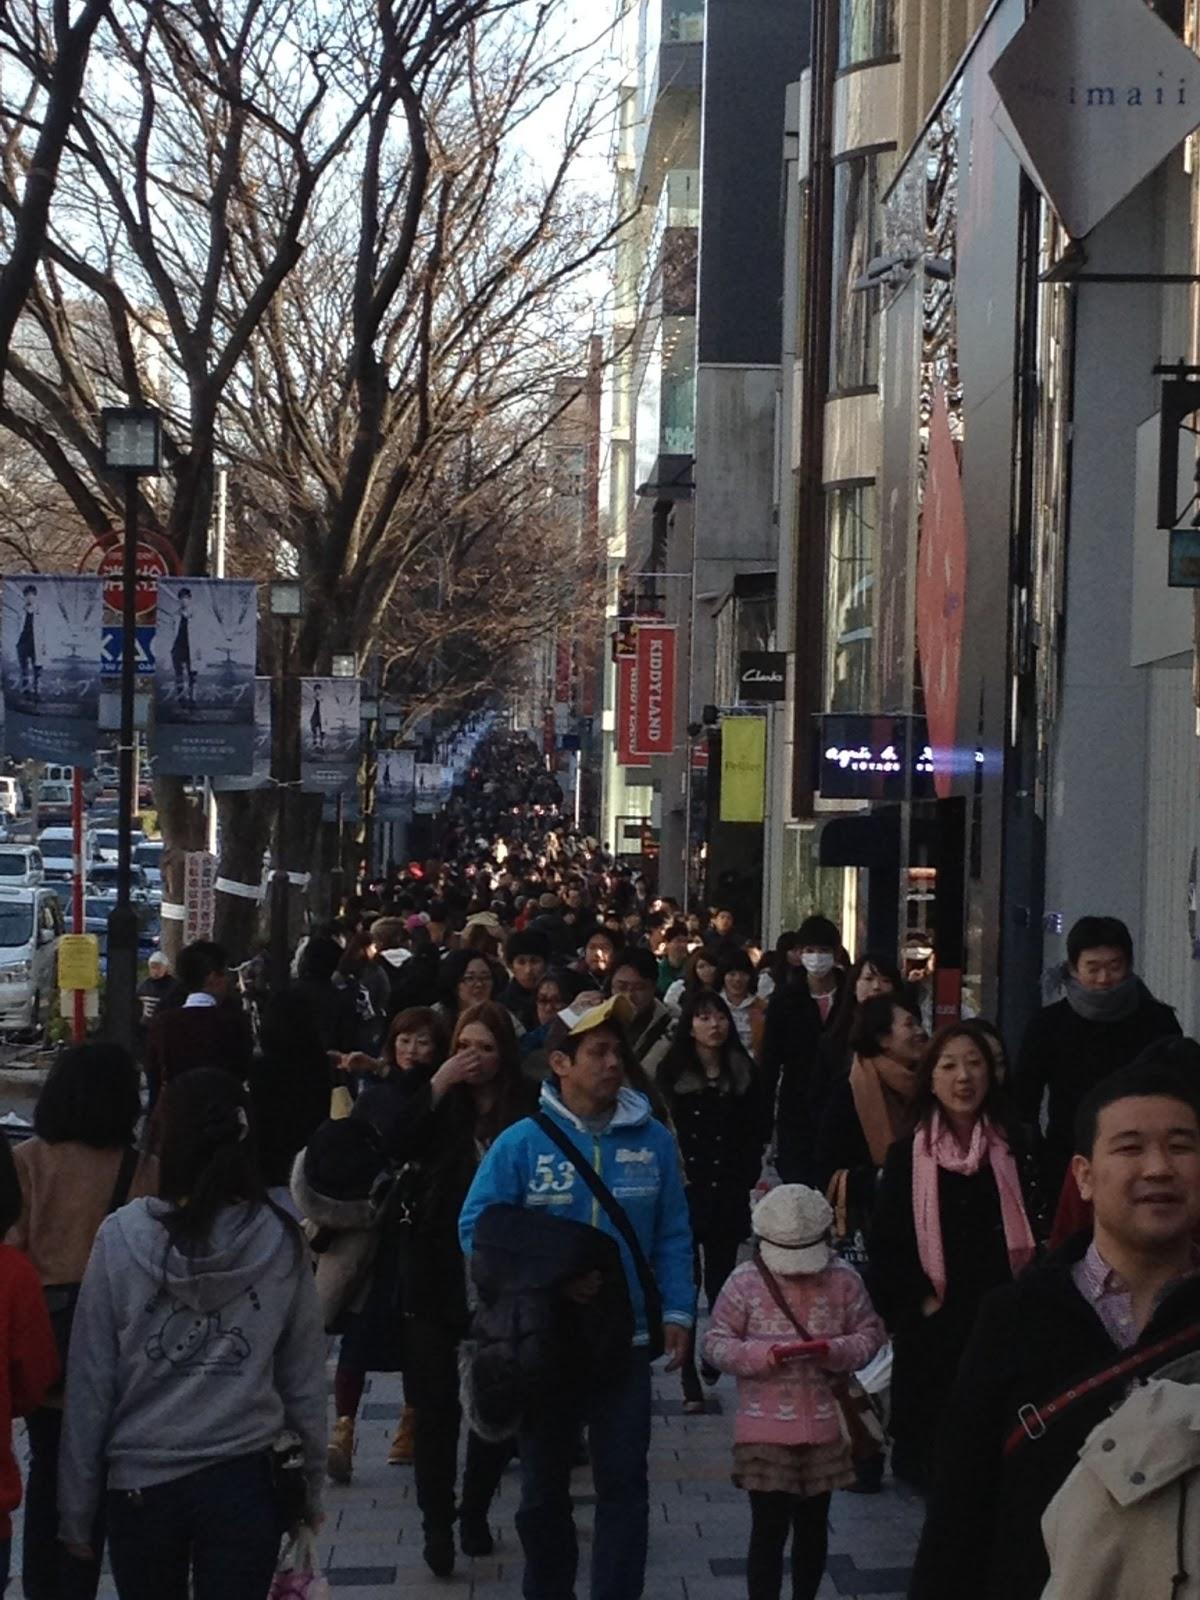 13/01/10-2/6 Japan Trip